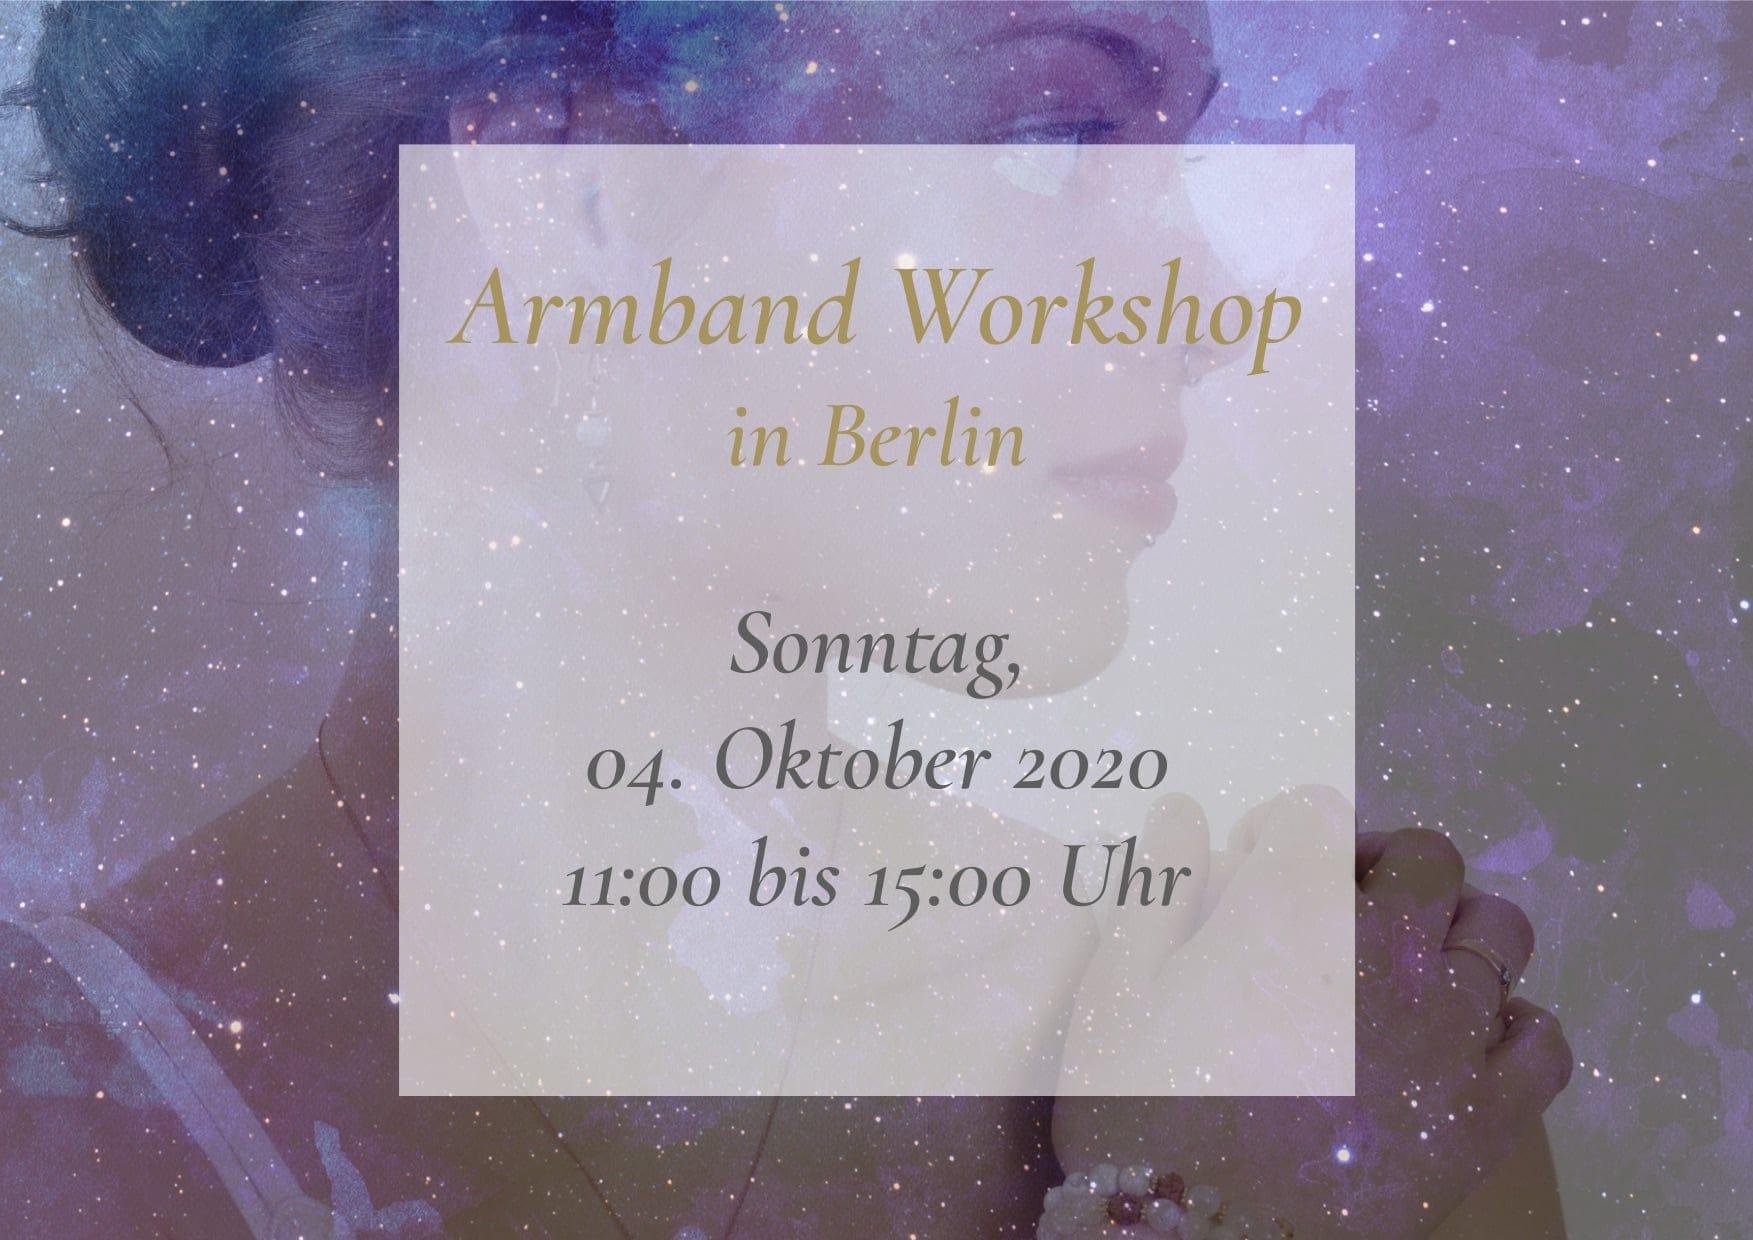 NW_Armband_WS_10_2020_Berlin_EN